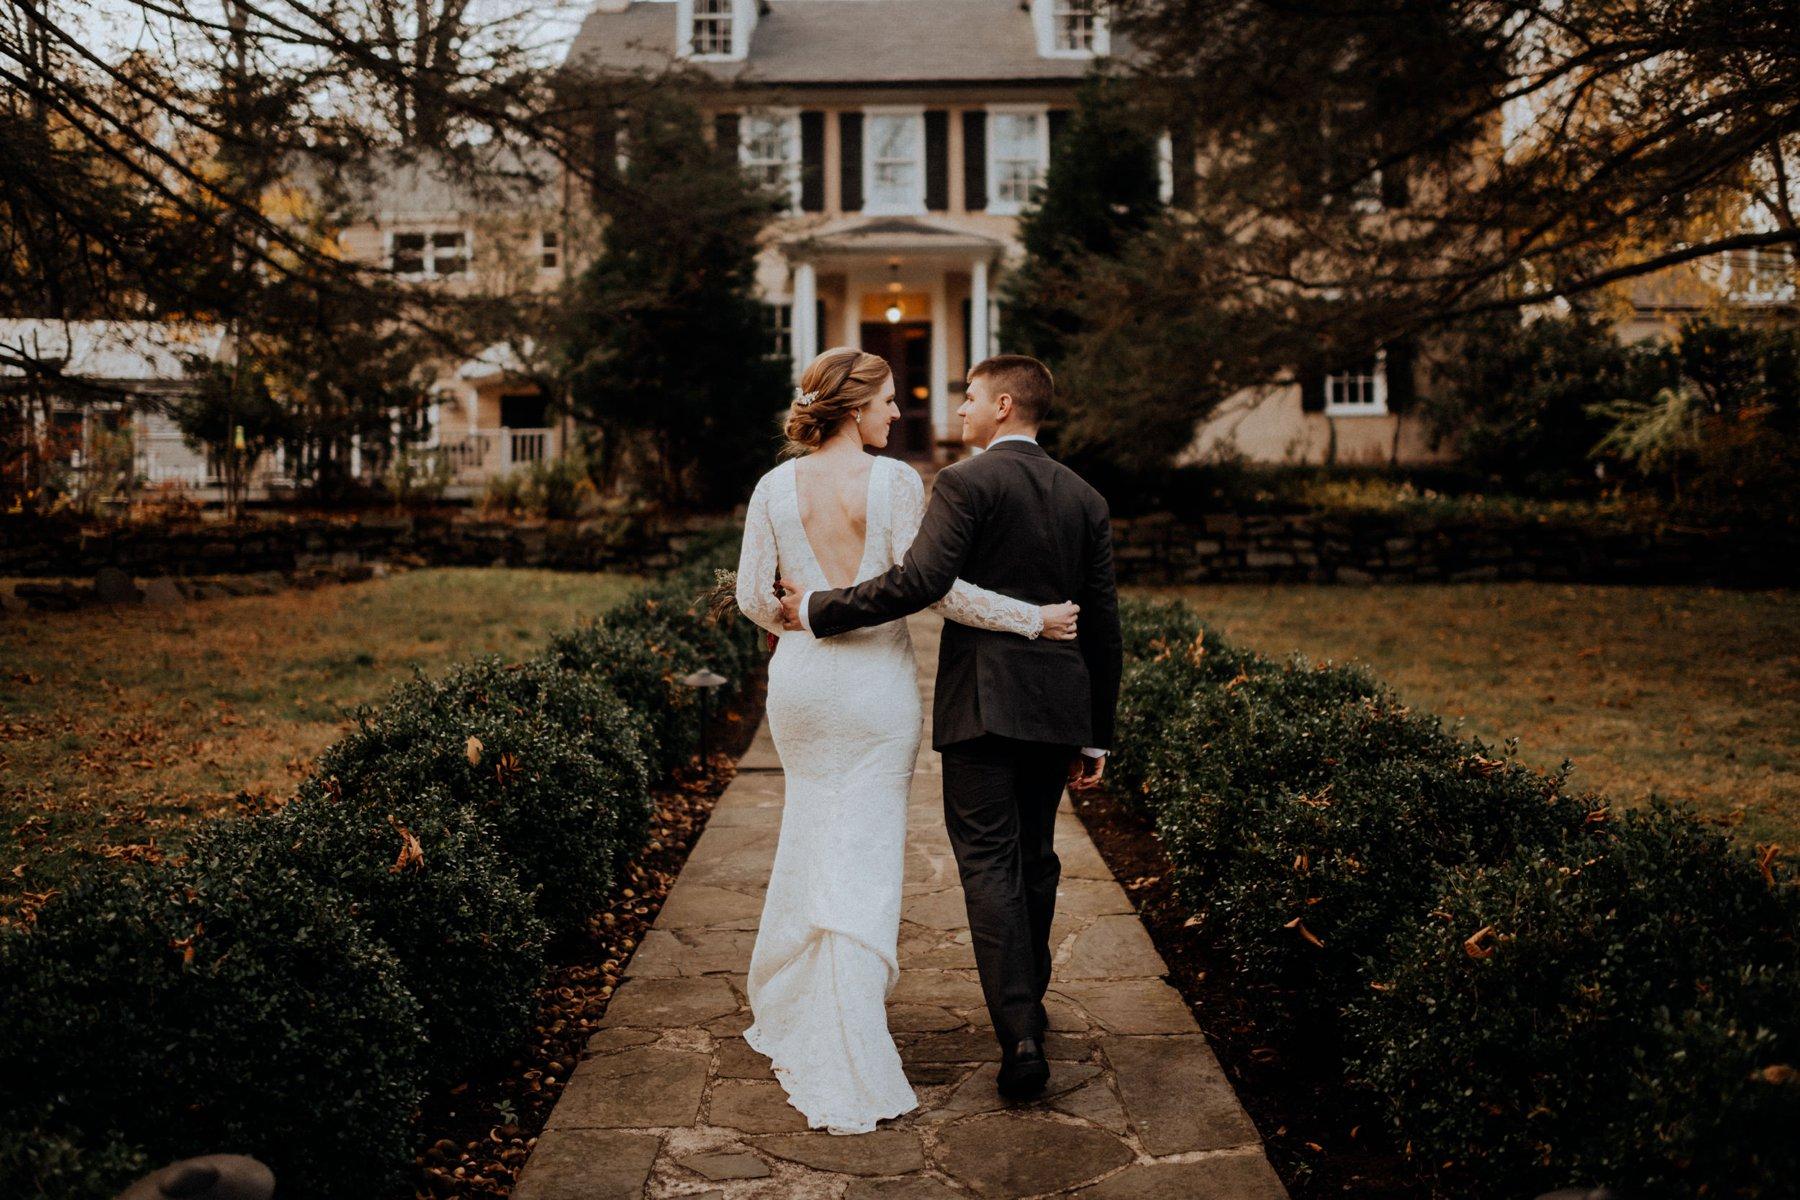 133-122-holly-hedge-wedding-6.jpg